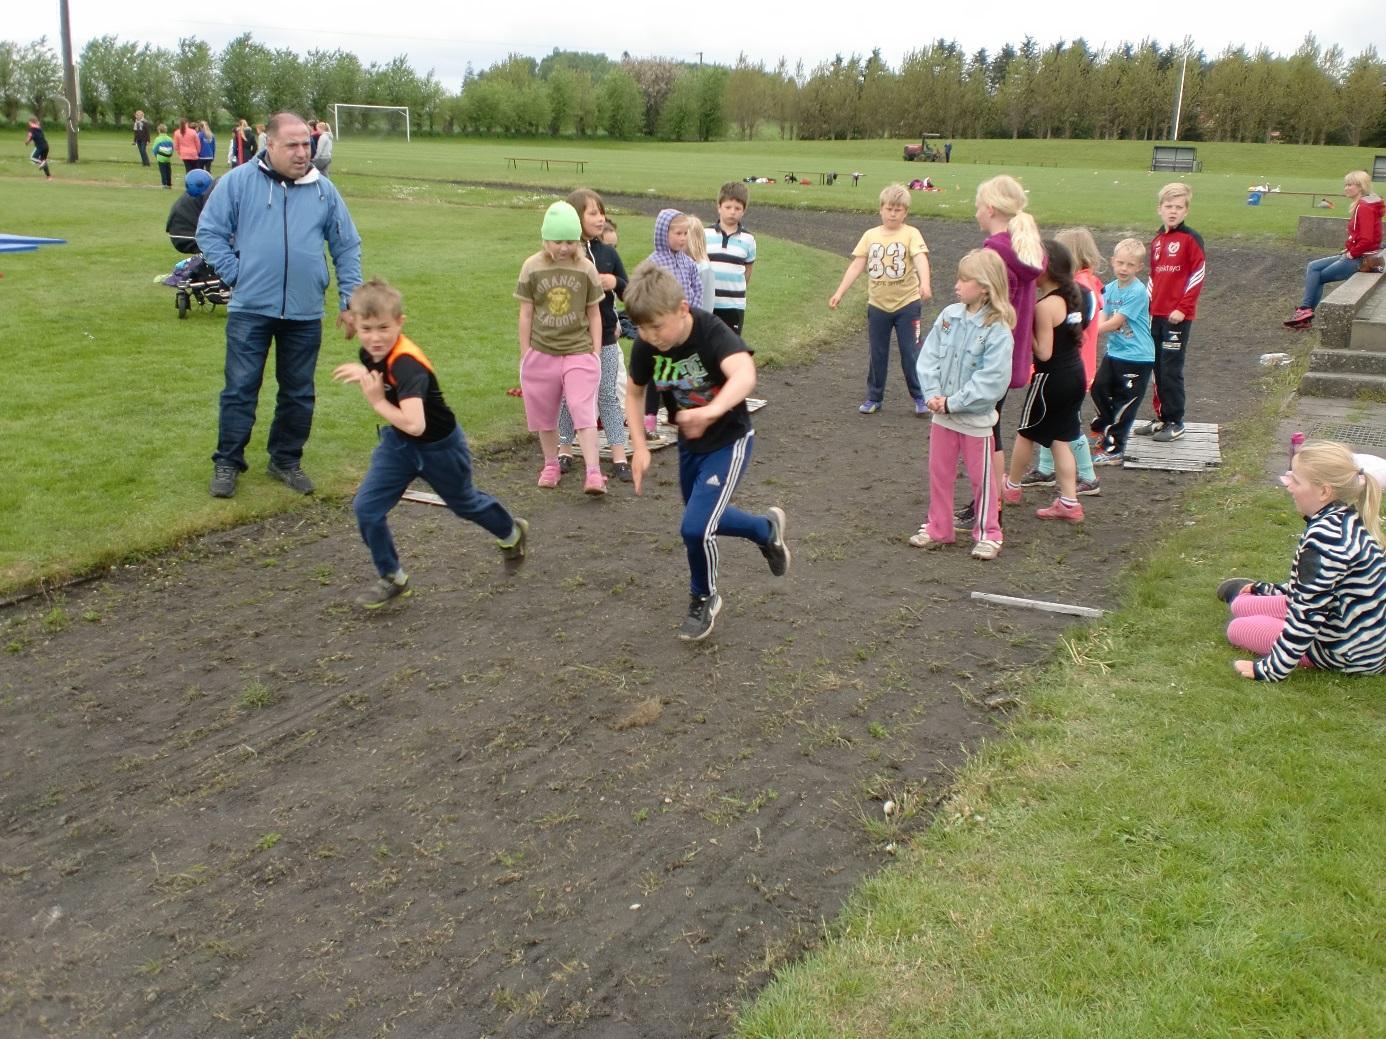 14 Ludvig 60 meter mot Calle Holmlund